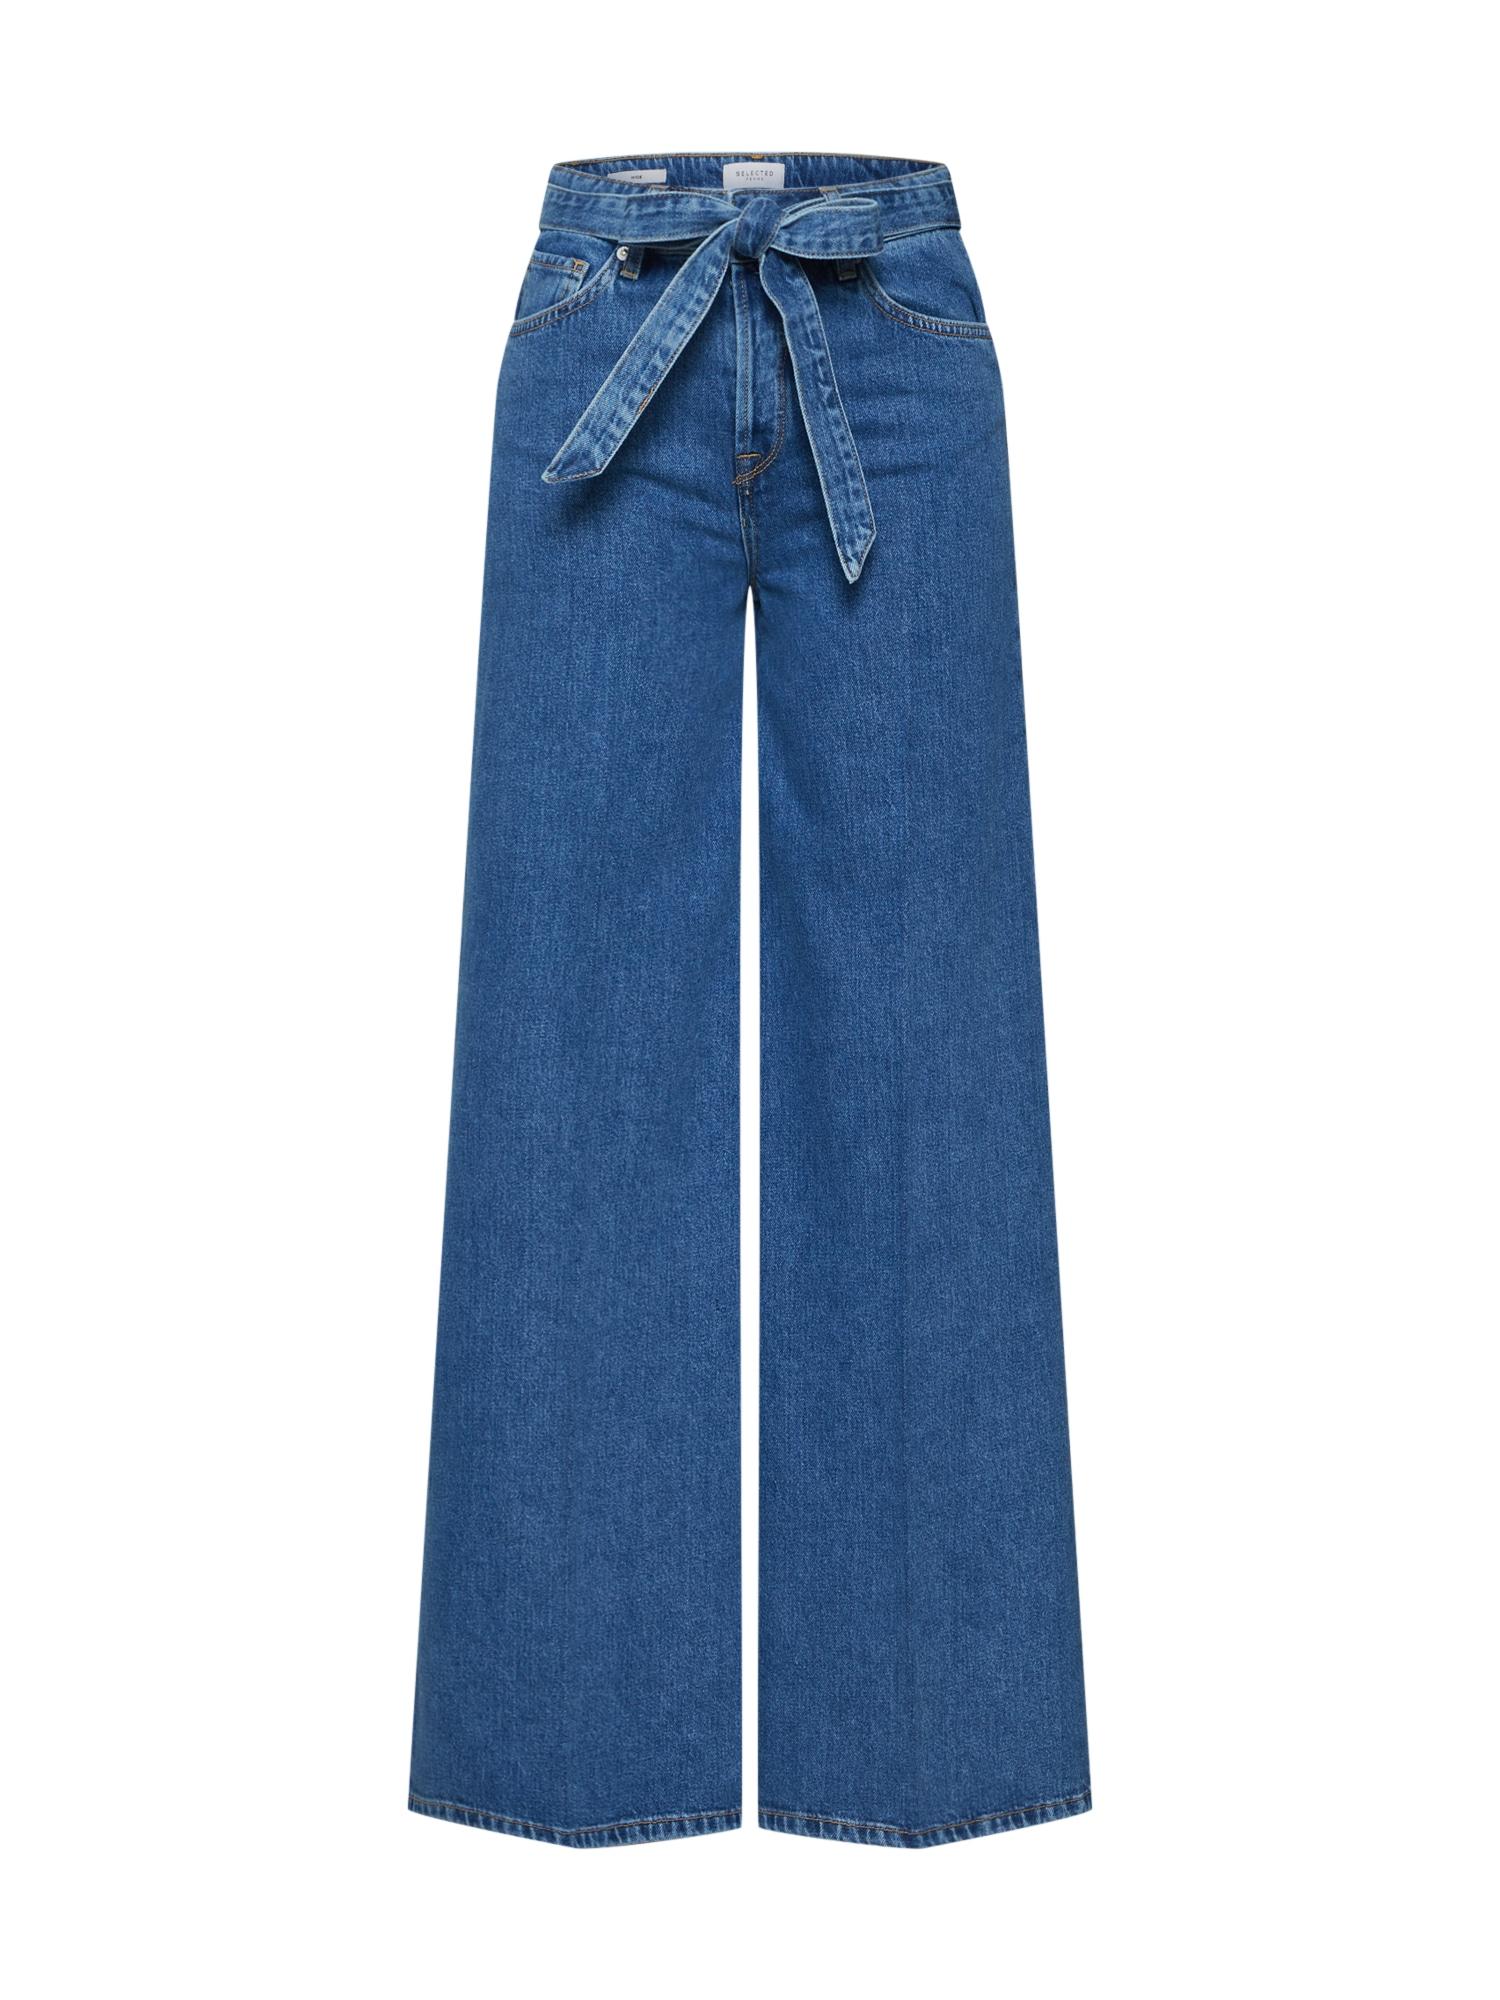 SELECTED FEMME Džinsai 'SLFLAURA' tamsiai (džinso) mėlyna